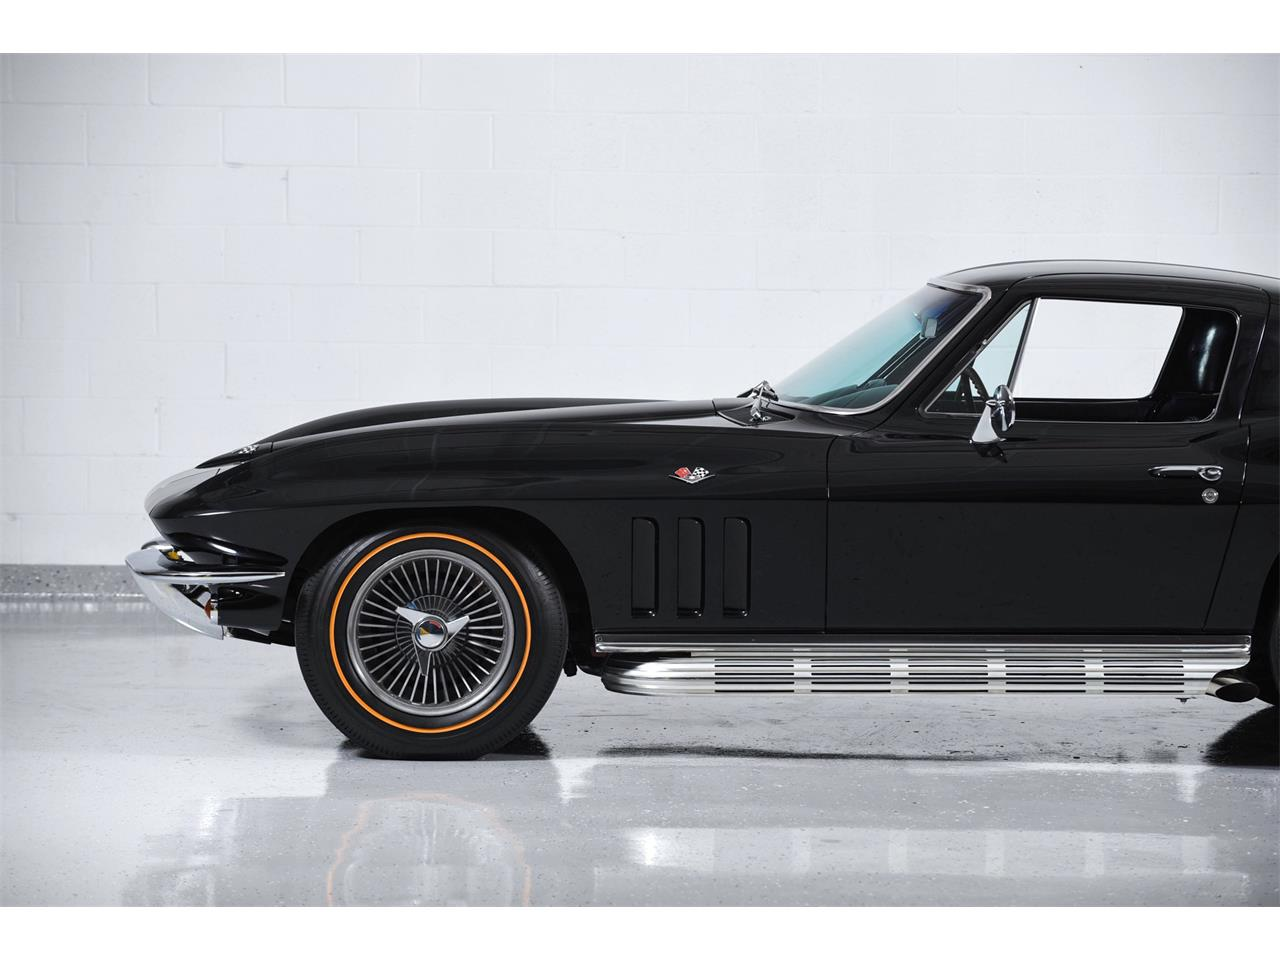 Large Picture of Classic '66 Corvette located in Farmingdale New York - $79,900.00 - Q1WK